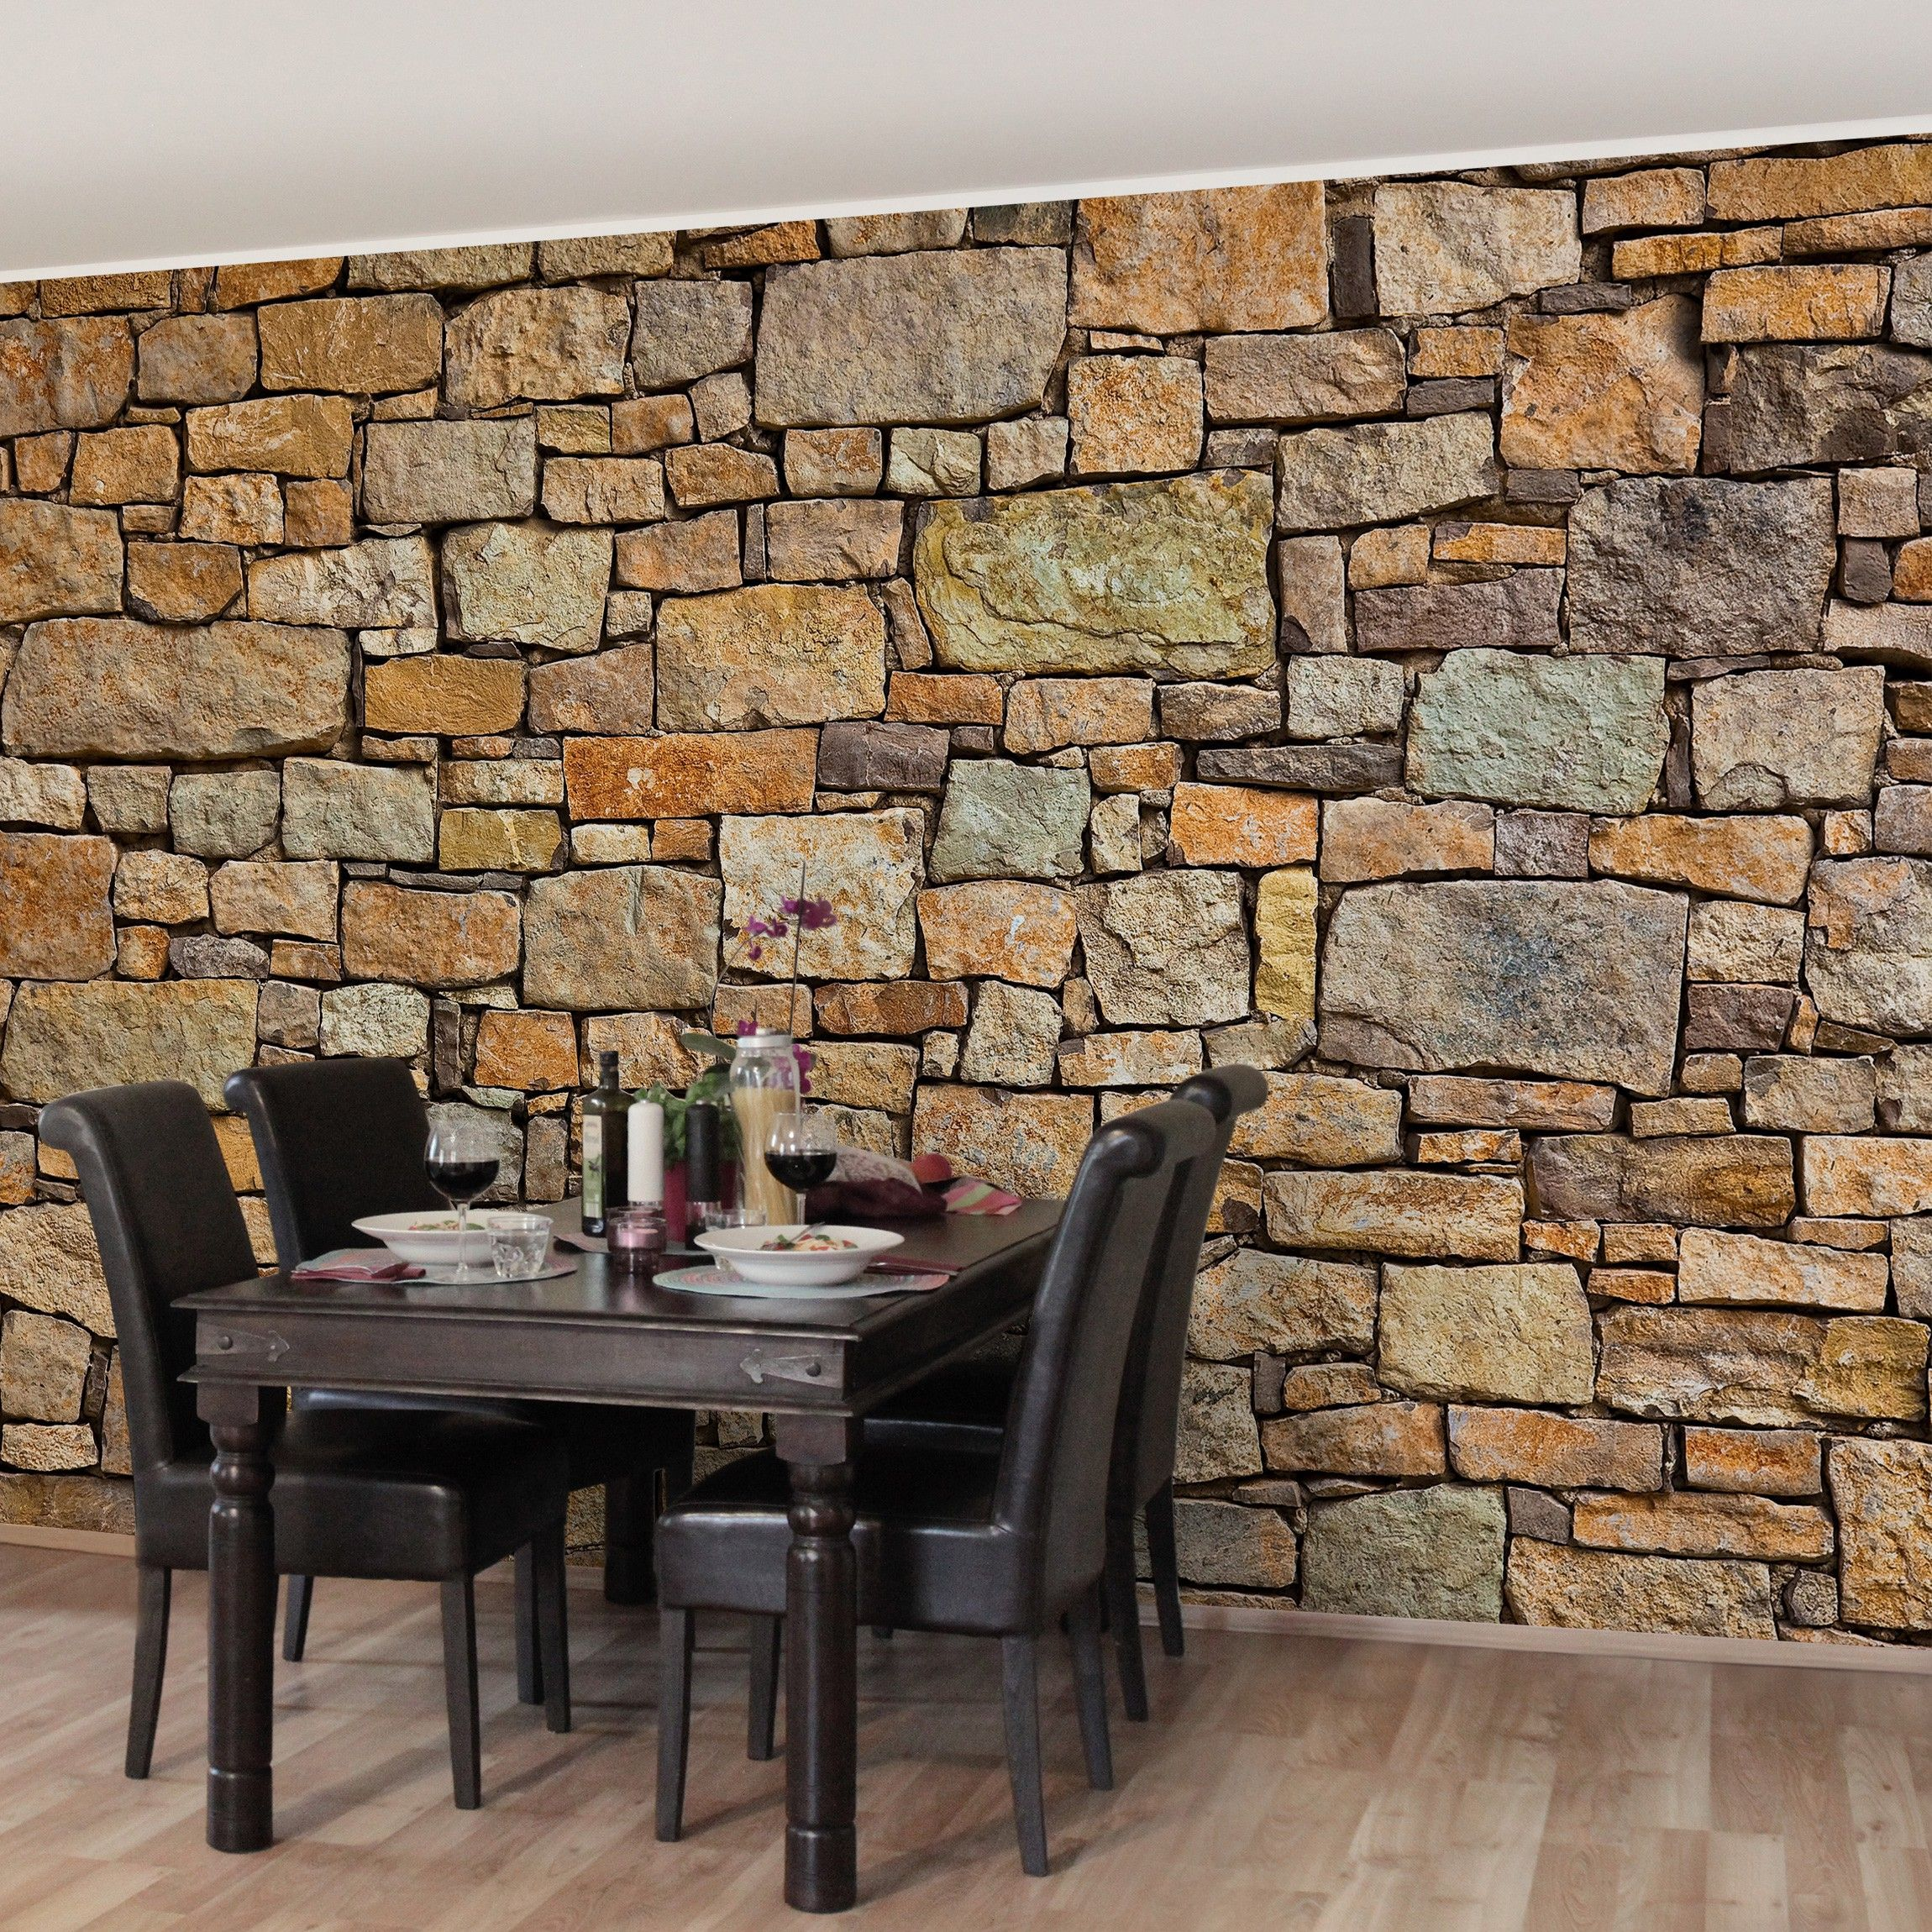 Tapeten Mediterran steintapete vliestapete premium croatia stonewall fototapete breit